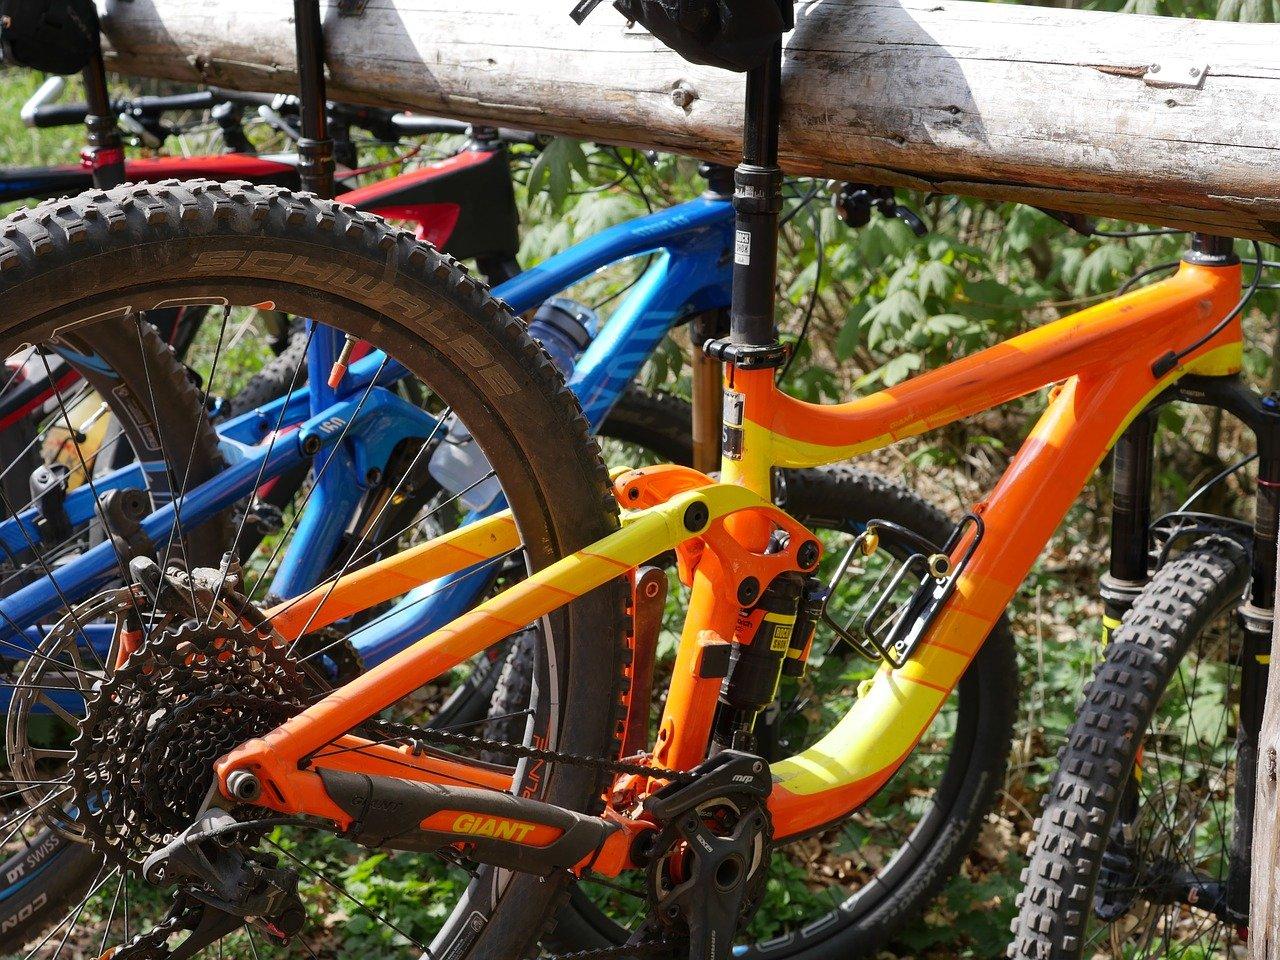 Bobingen & Königsbrunn |Vermehrt Diebstahl wertvoller Fahrräder